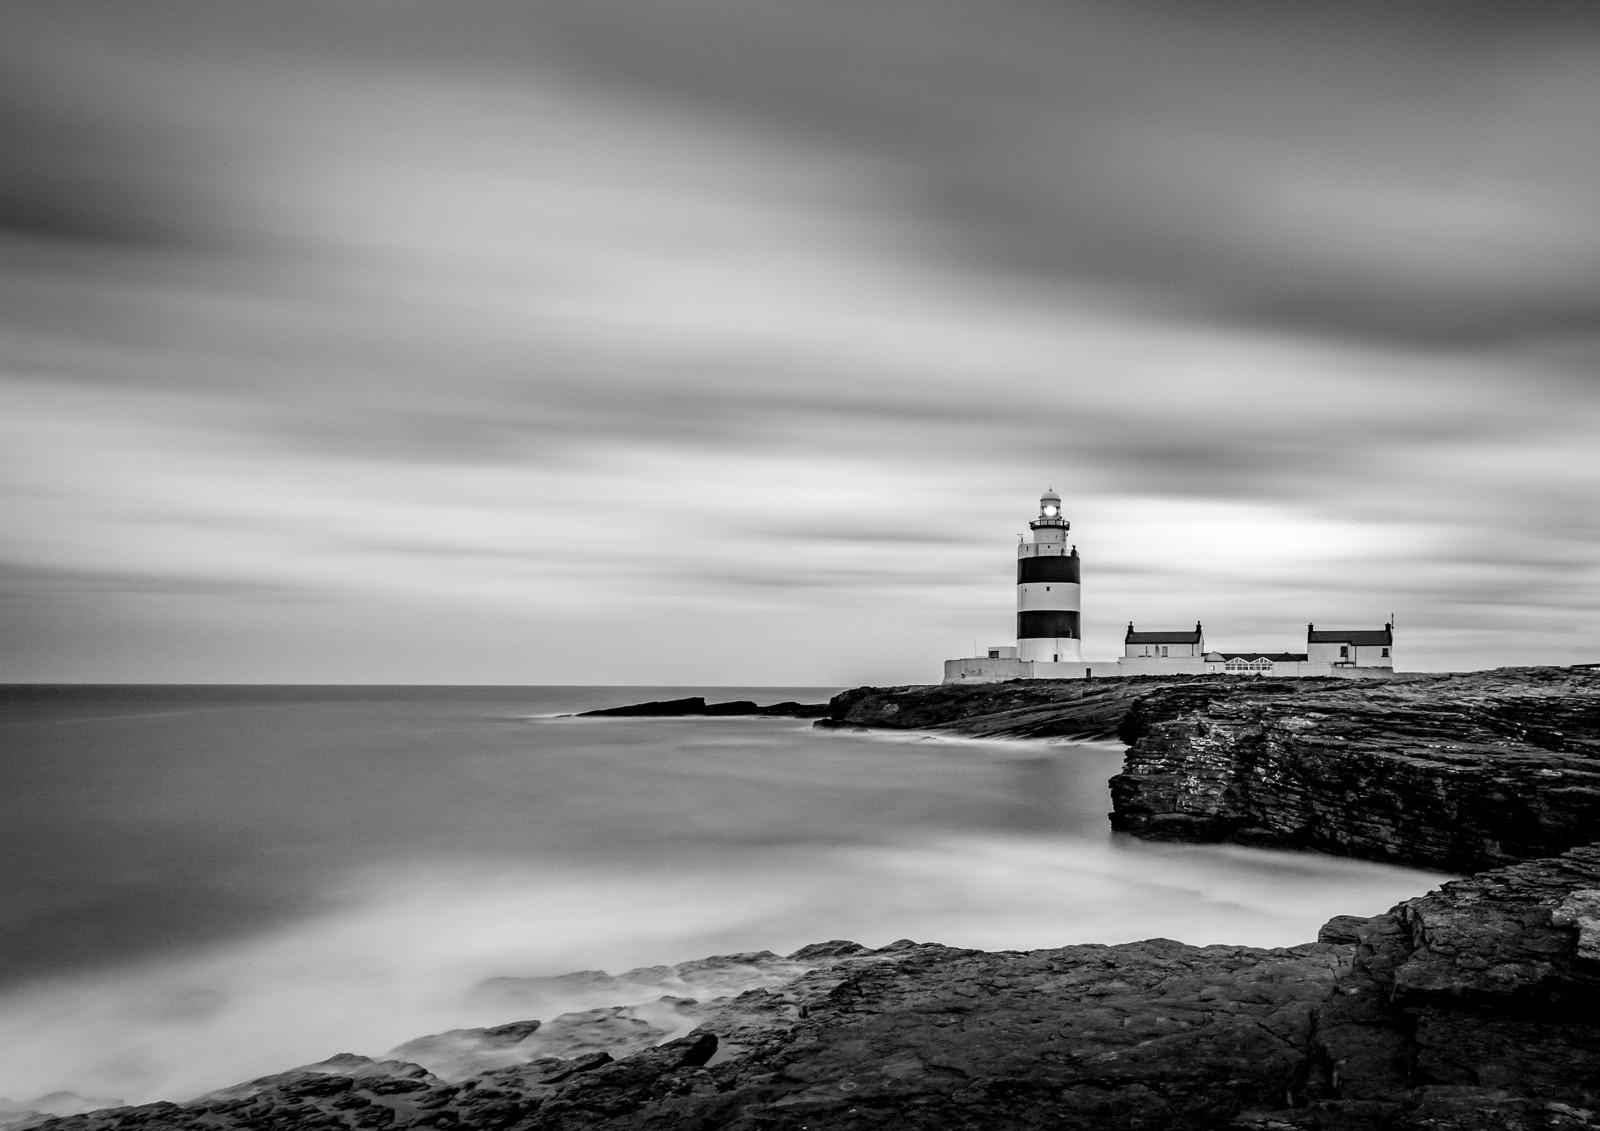 MONO - Hook Head Lighthouse by Stephen McComb (12 marks)